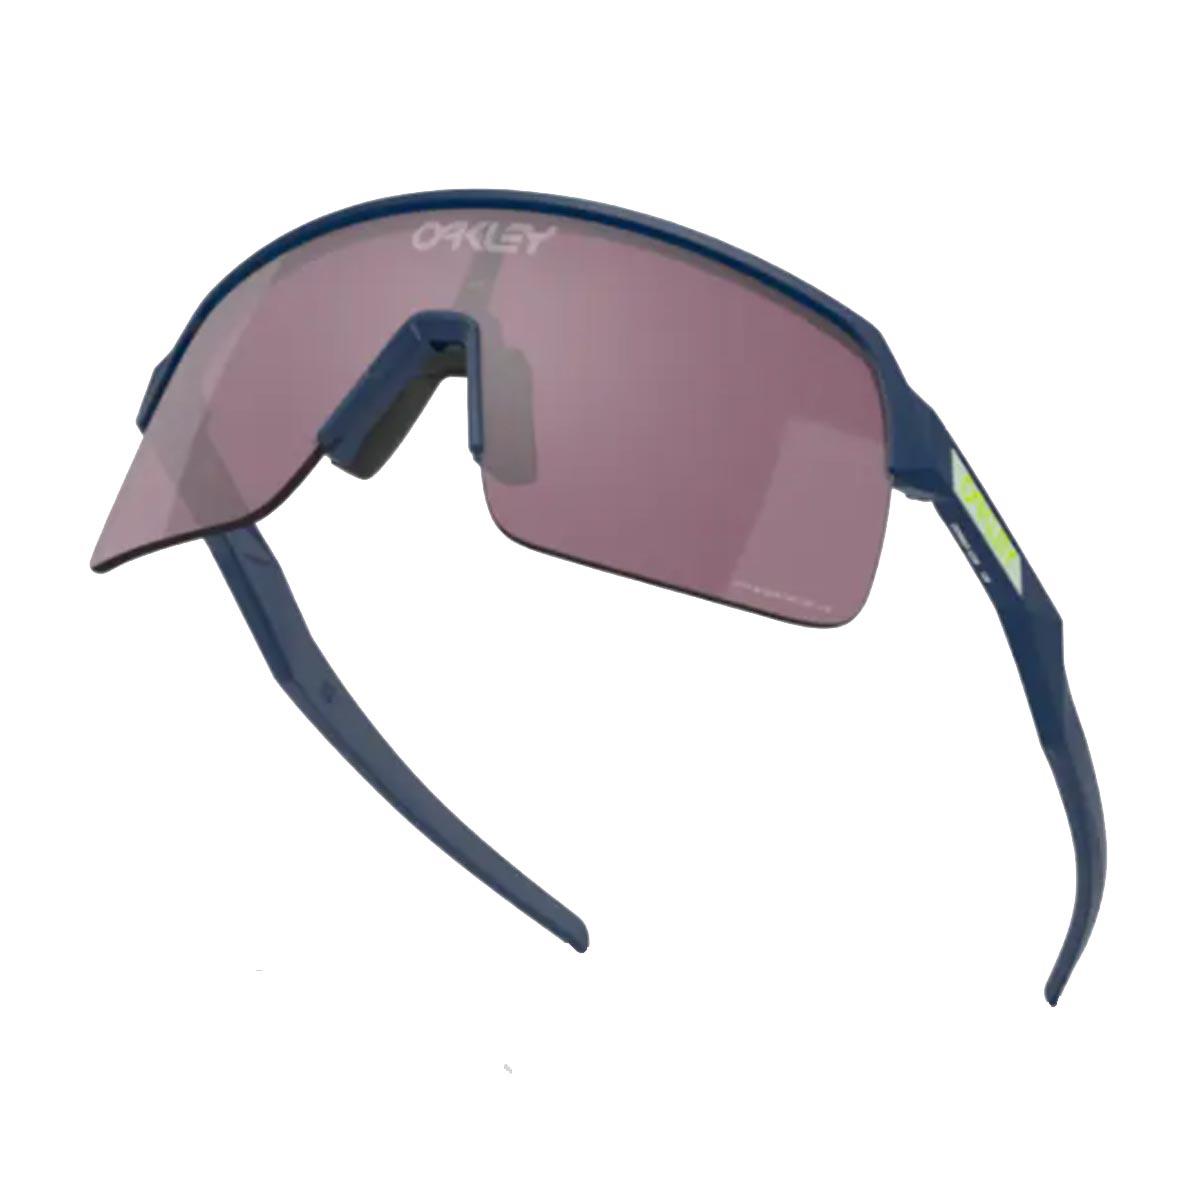 Oculos Para Ciclismo Oakley Sutro Lite Matte Poseidon com Lente Prizm Road Black Escura